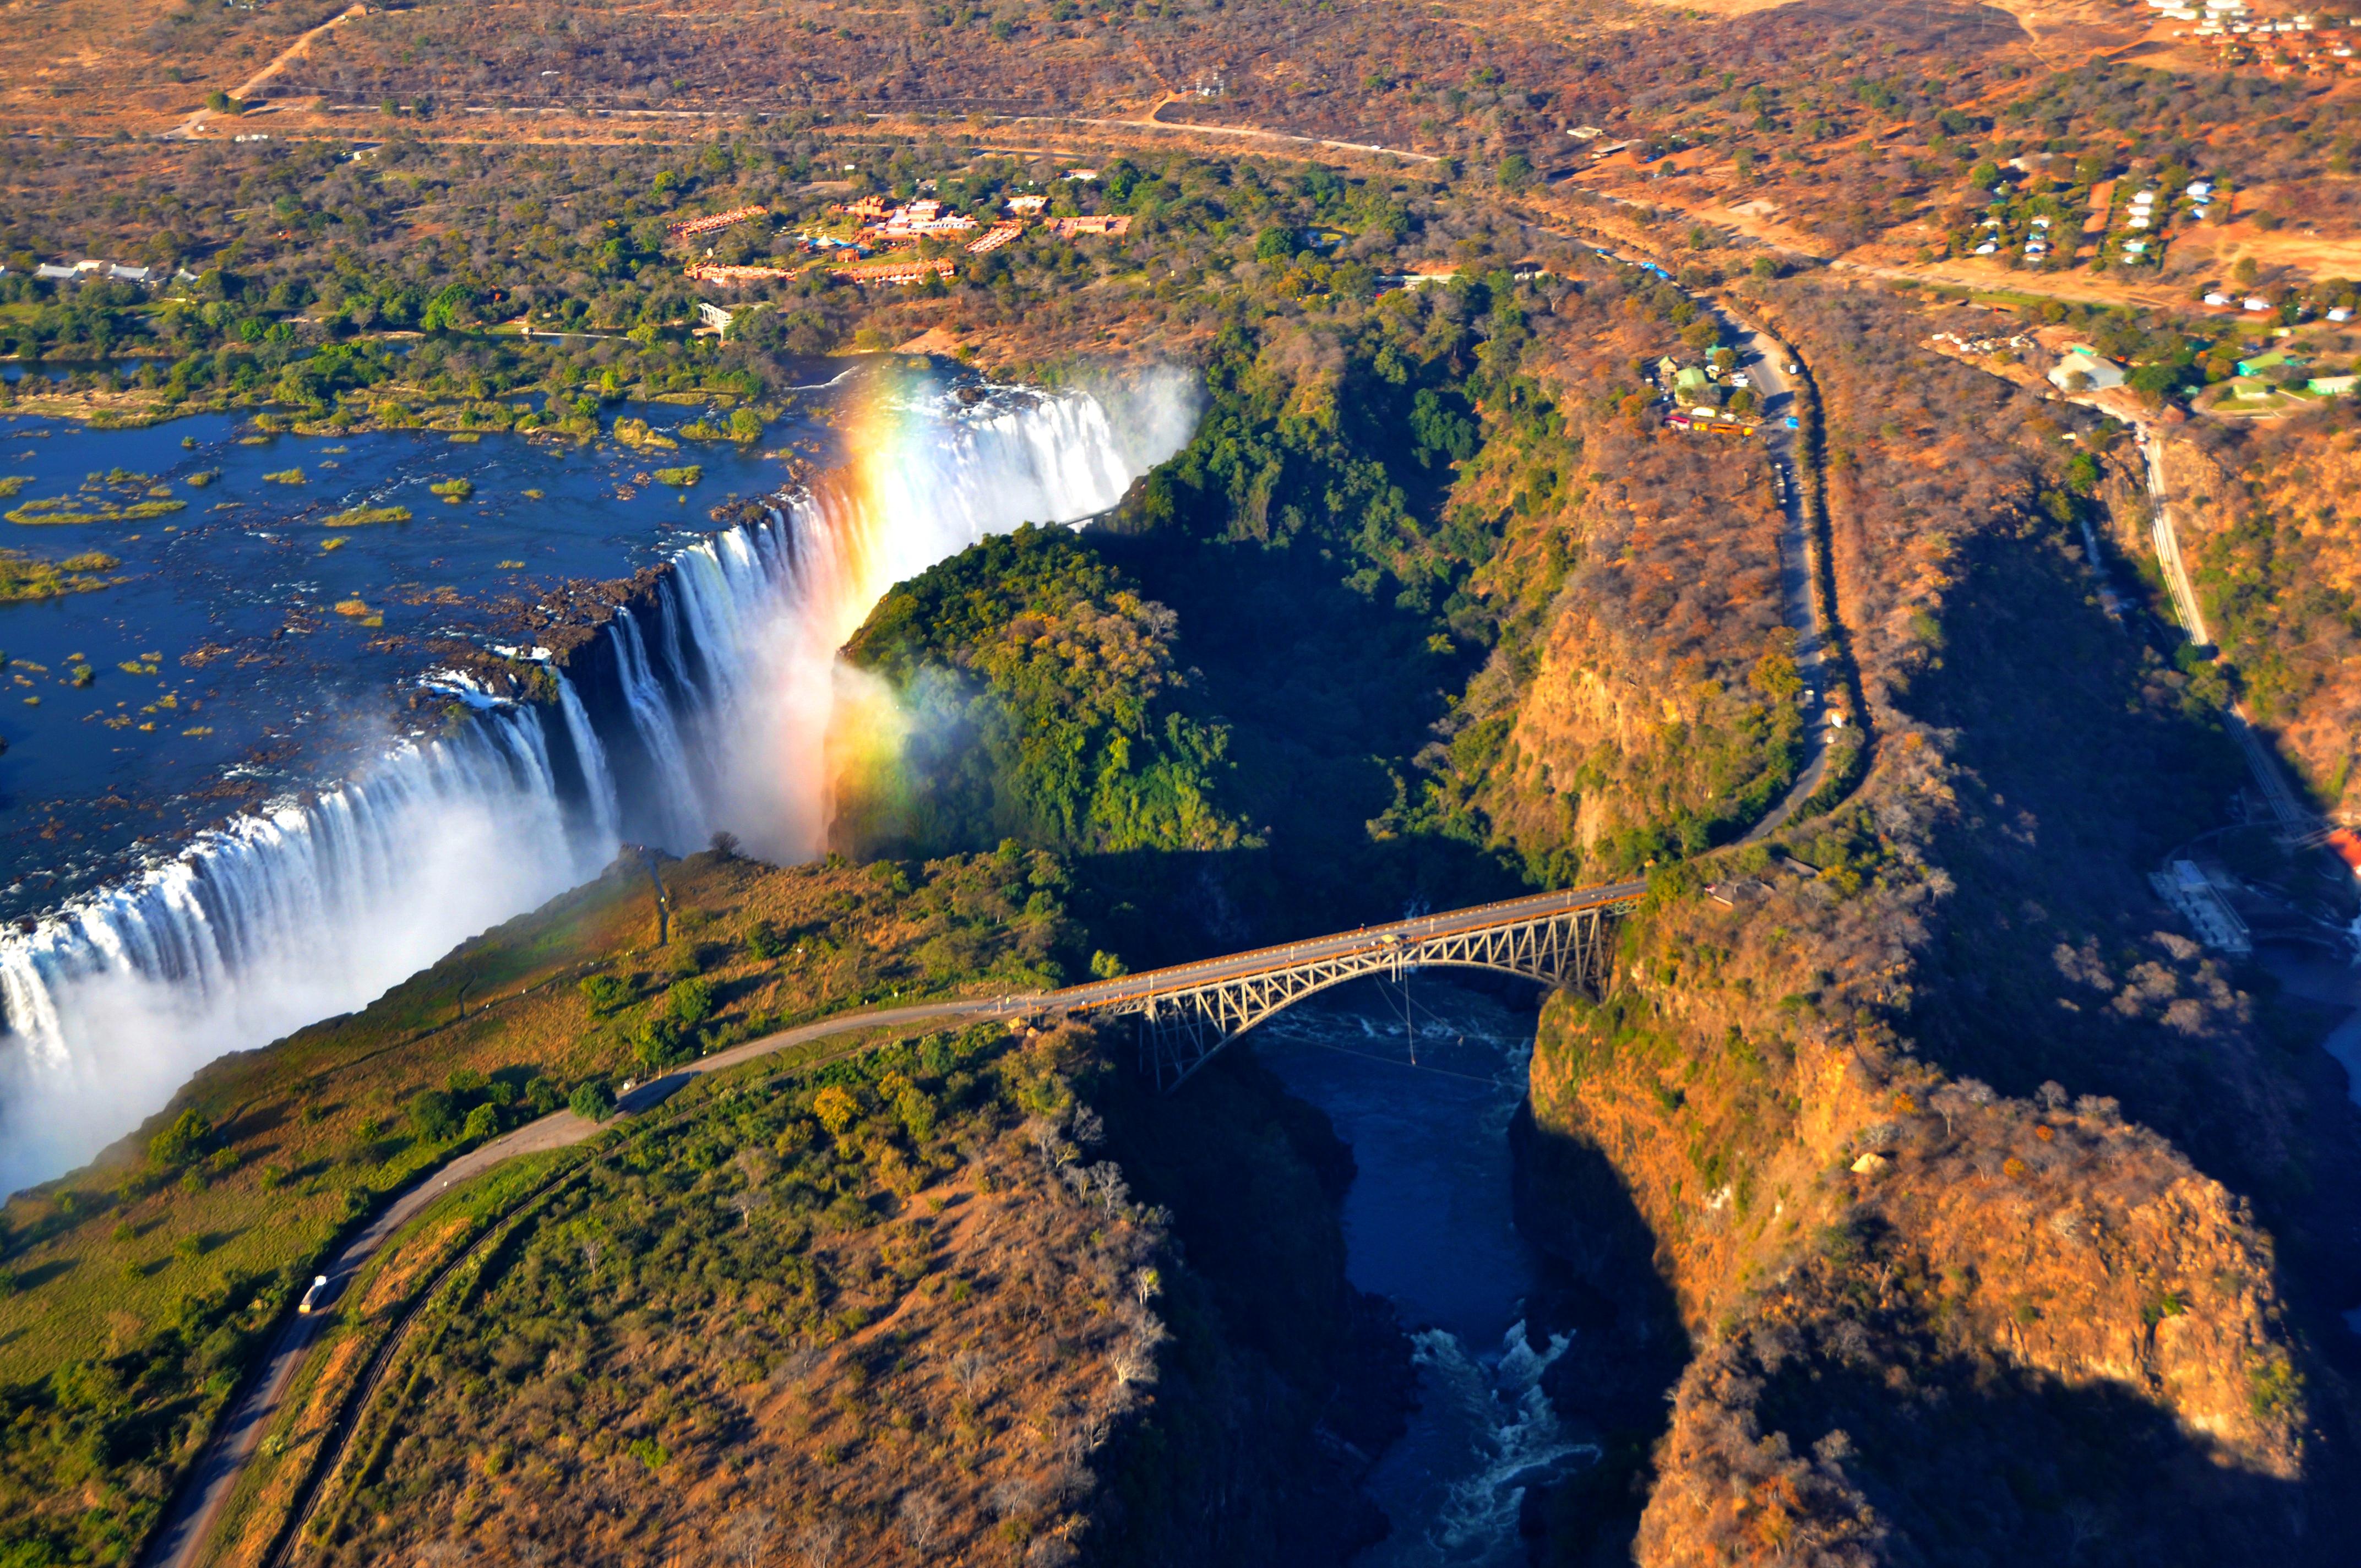 #Zimbabwe: World of Wonders-The Pleasure Awaits!